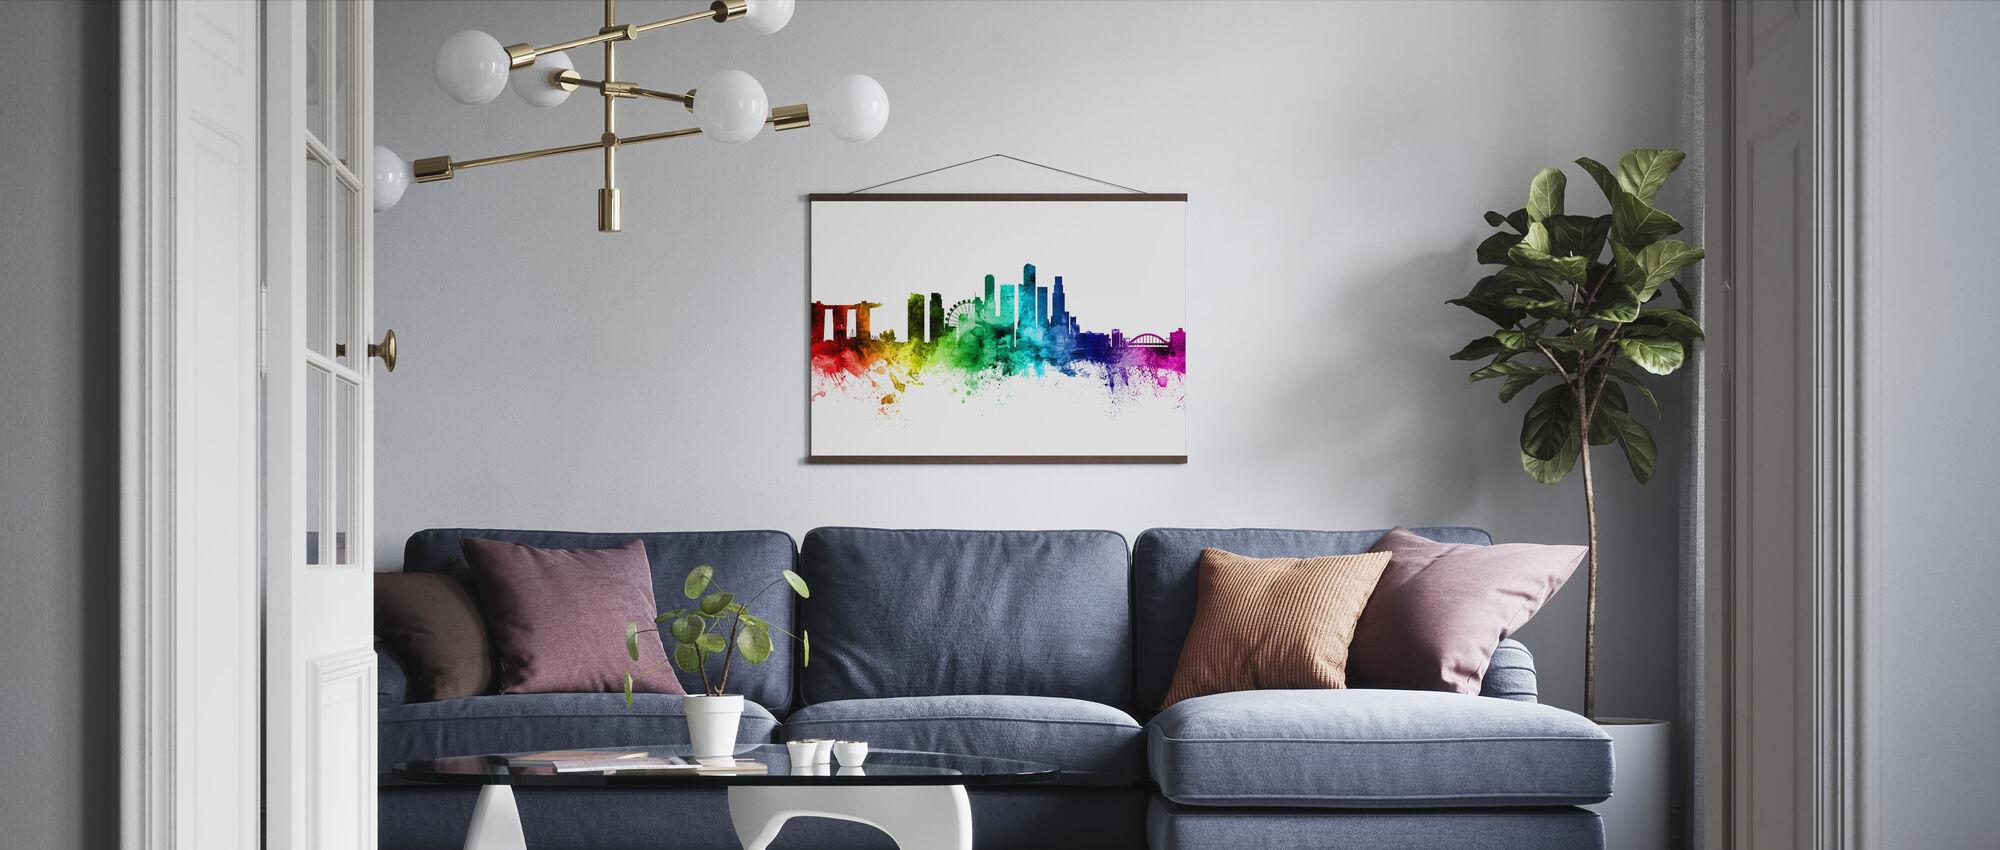 Singapore Skyline - Plakat - Stue